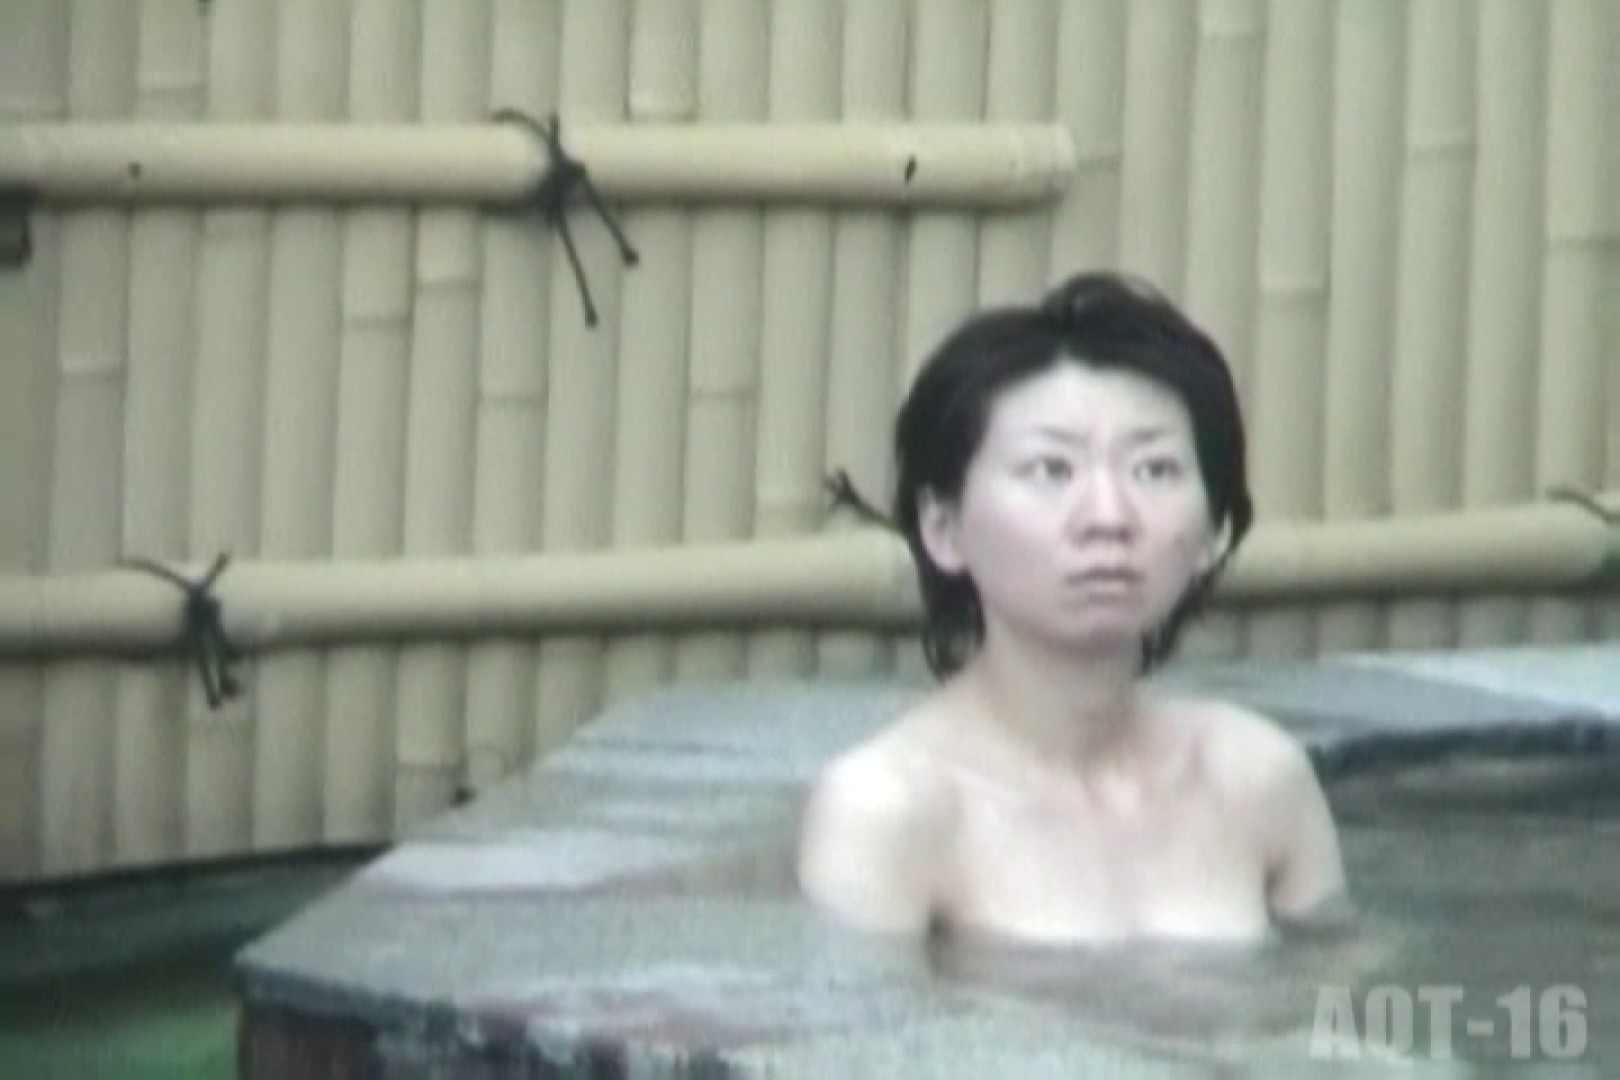 Aquaな露天風呂Vol.842 露天 オメコ無修正動画無料 44連発 14